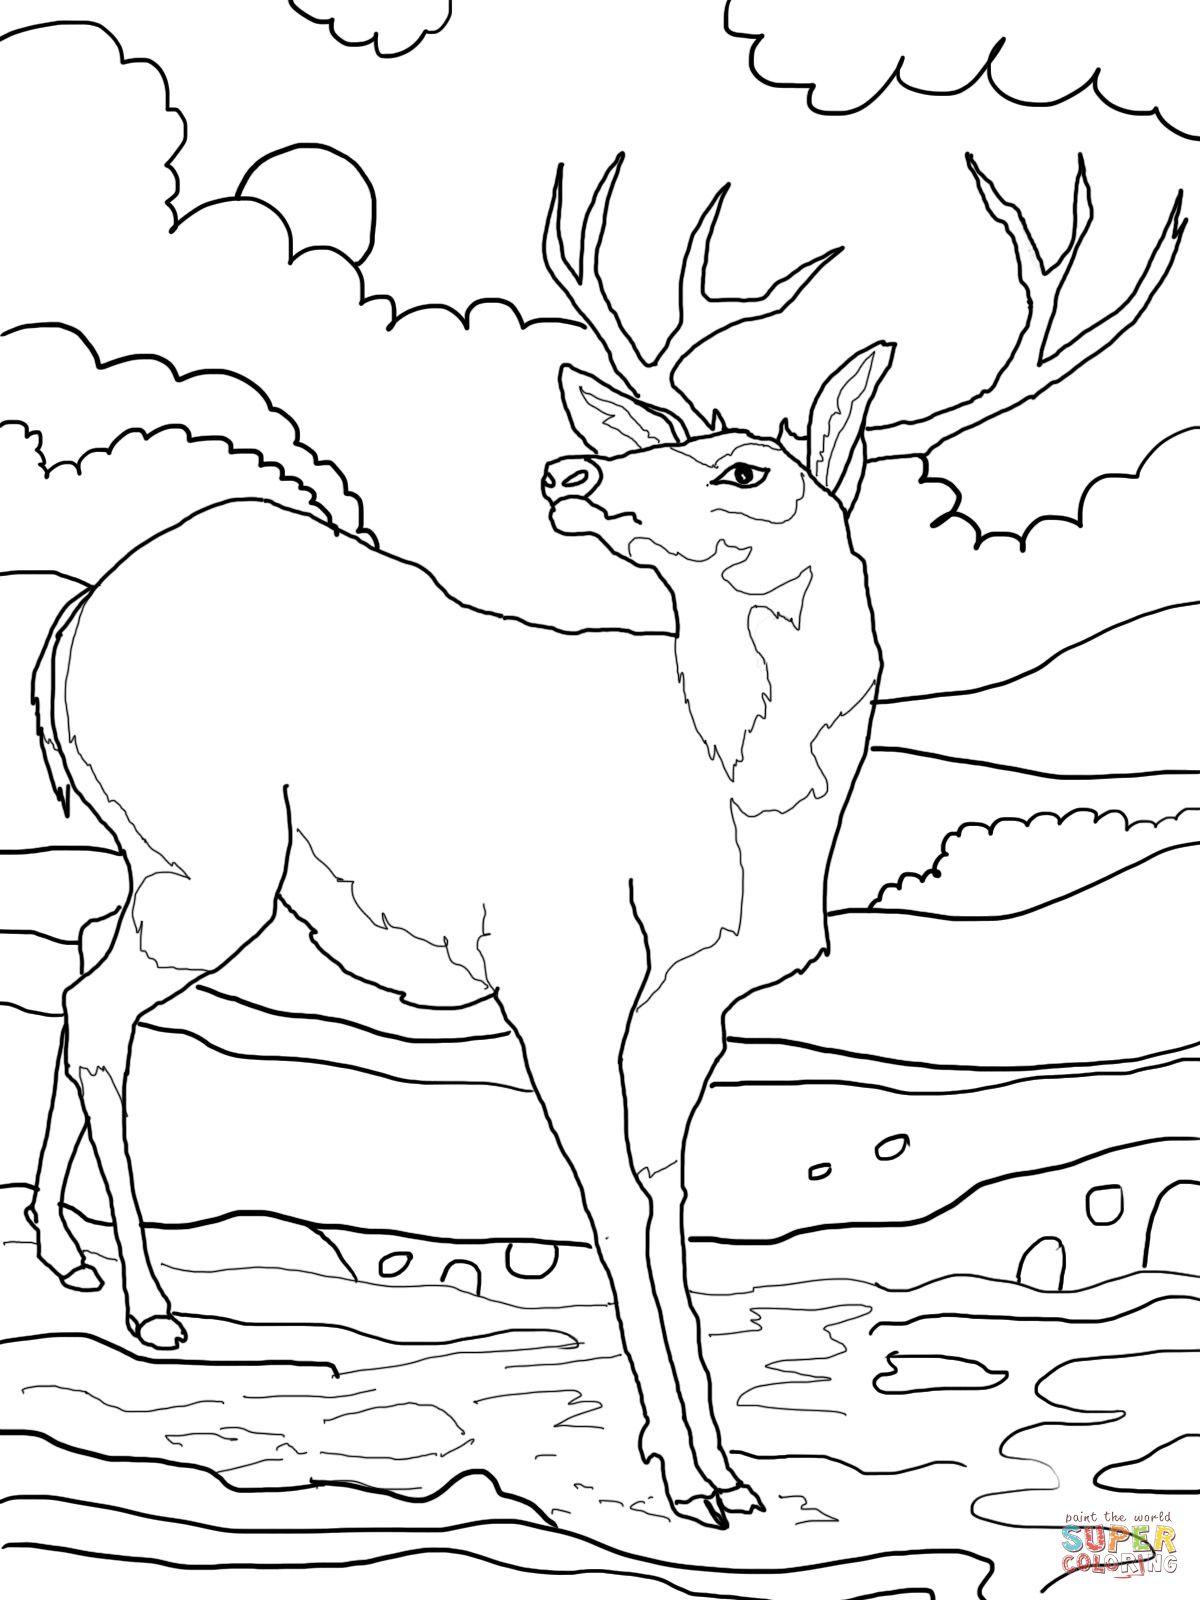 Deer Printable Pictures Supercoloring Com Deer Coloring Pages Horse Coloring Pages Family Coloring Pages